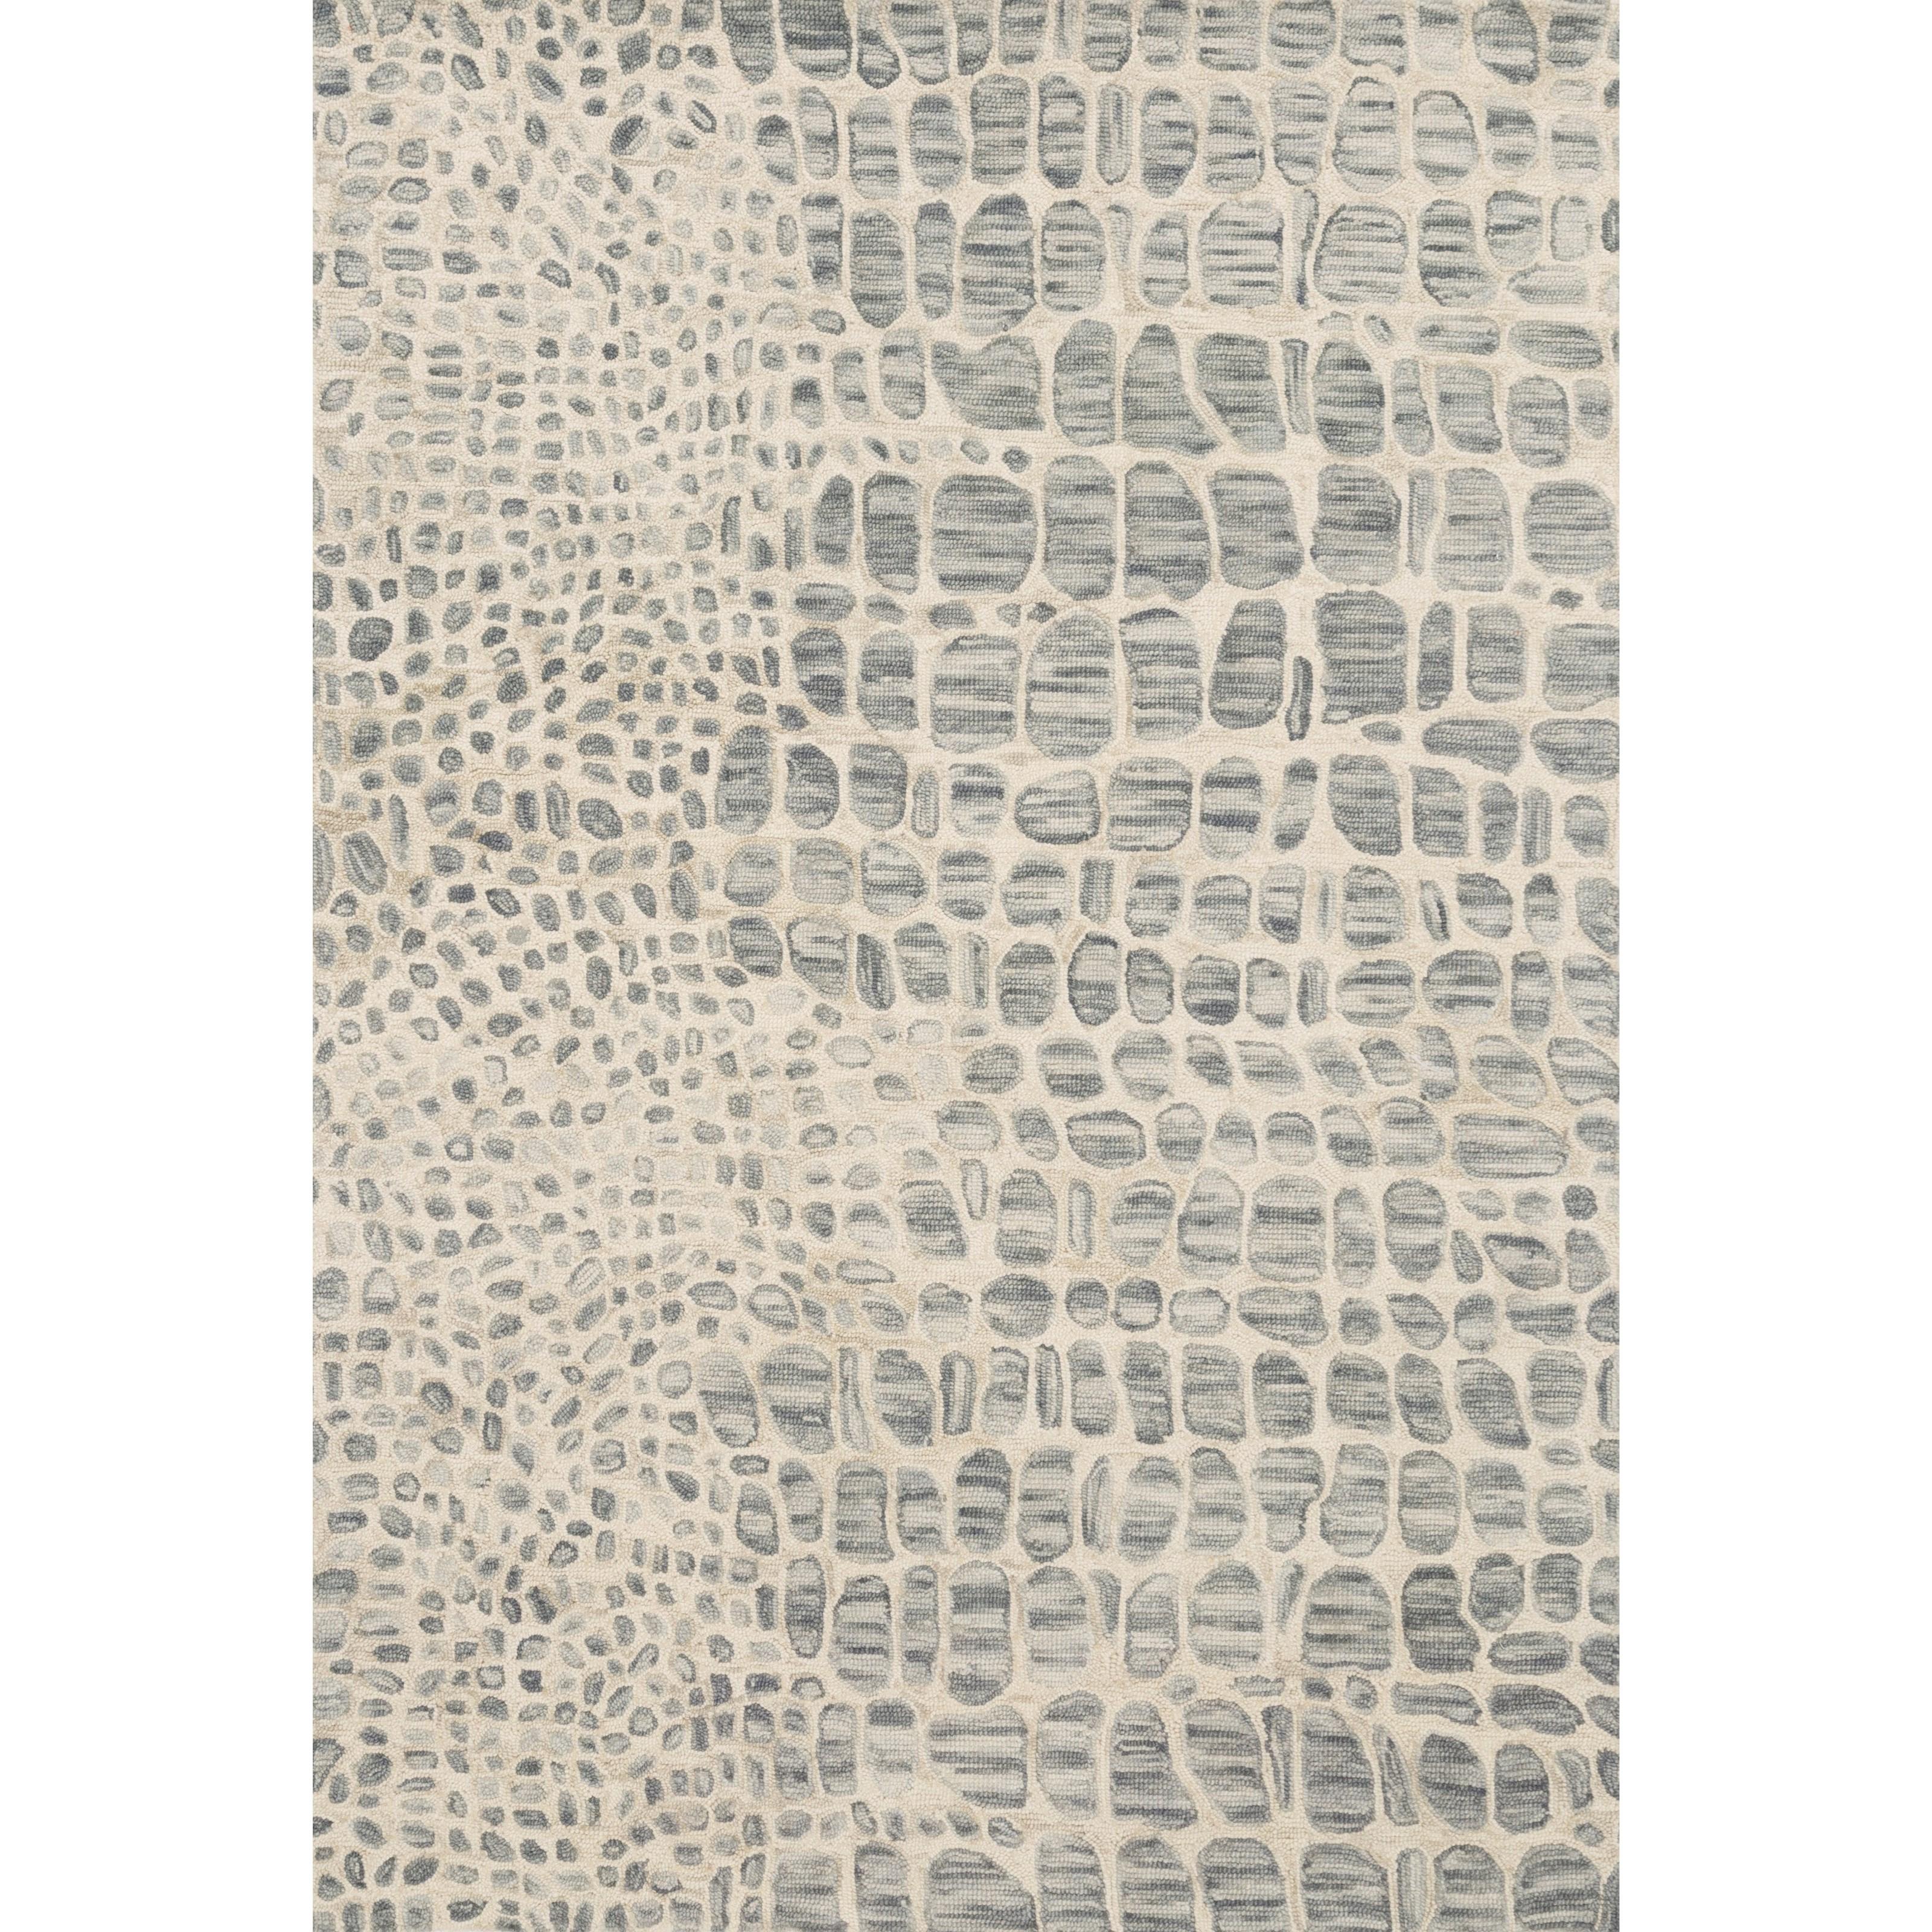 "Masai 3'6"" x 5'6"" Silver Grey / Ivory Rug by Loloi Rugs at Sprintz Furniture"